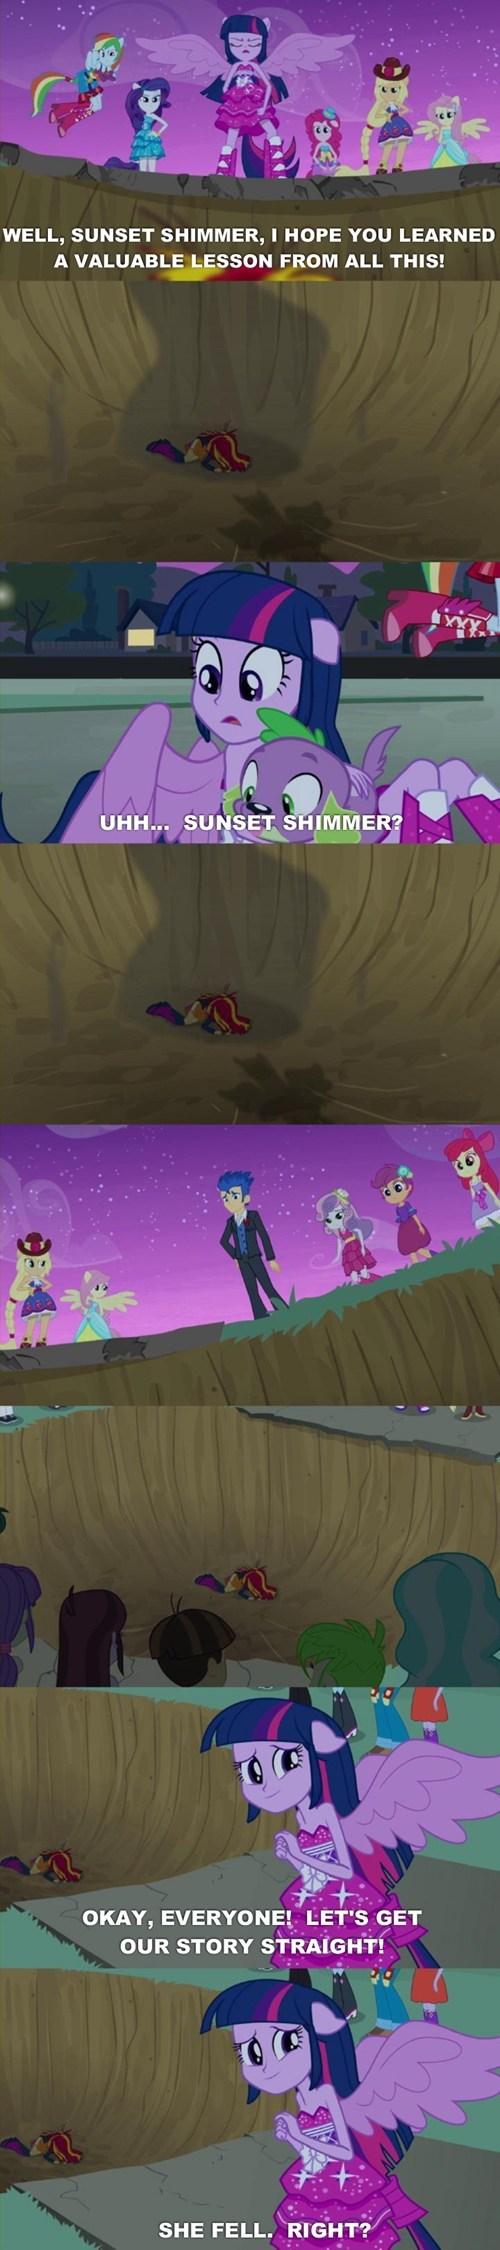 dead lol equestria girls sunset shimmer - 7779300608